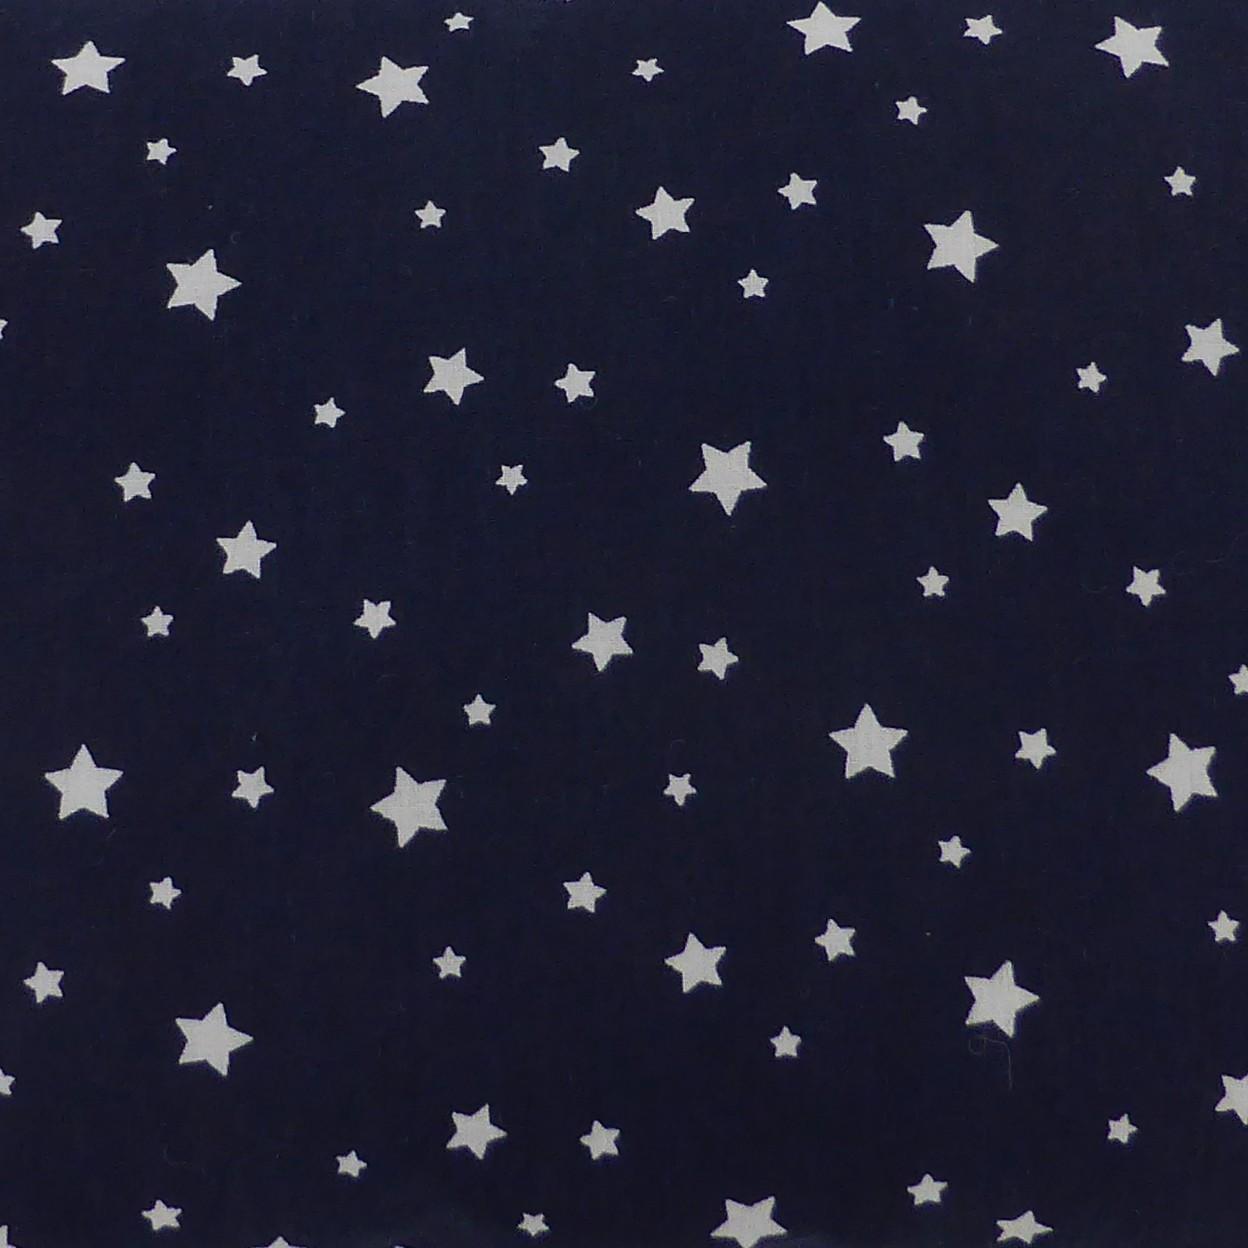 Étoiles marines